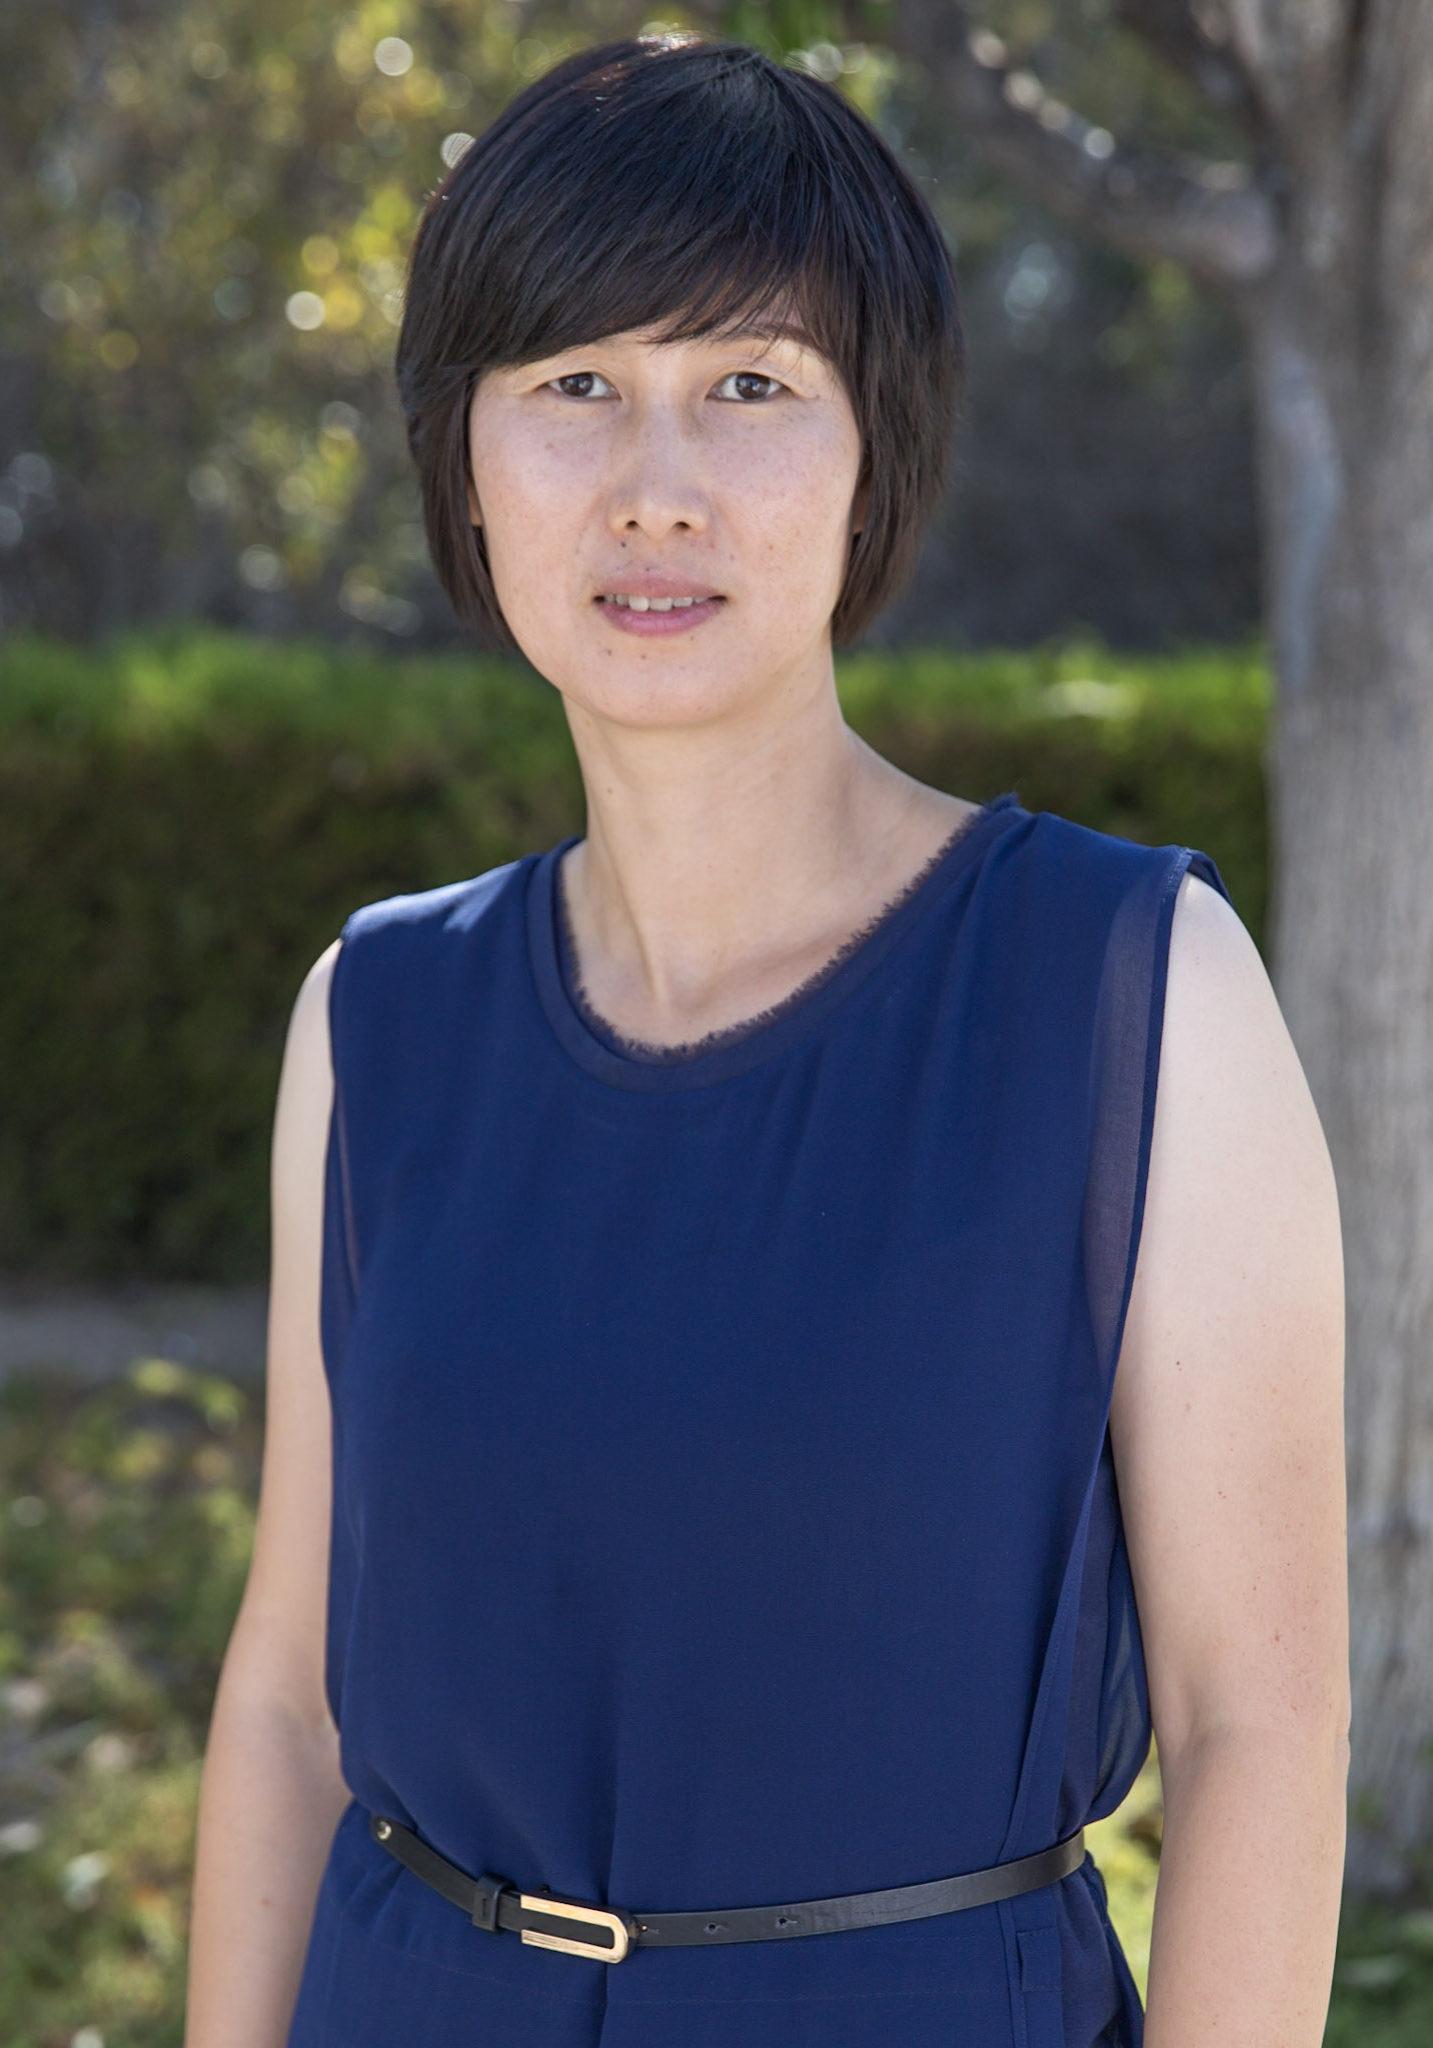 Liwei Chen RN Case Manager. Supervisor